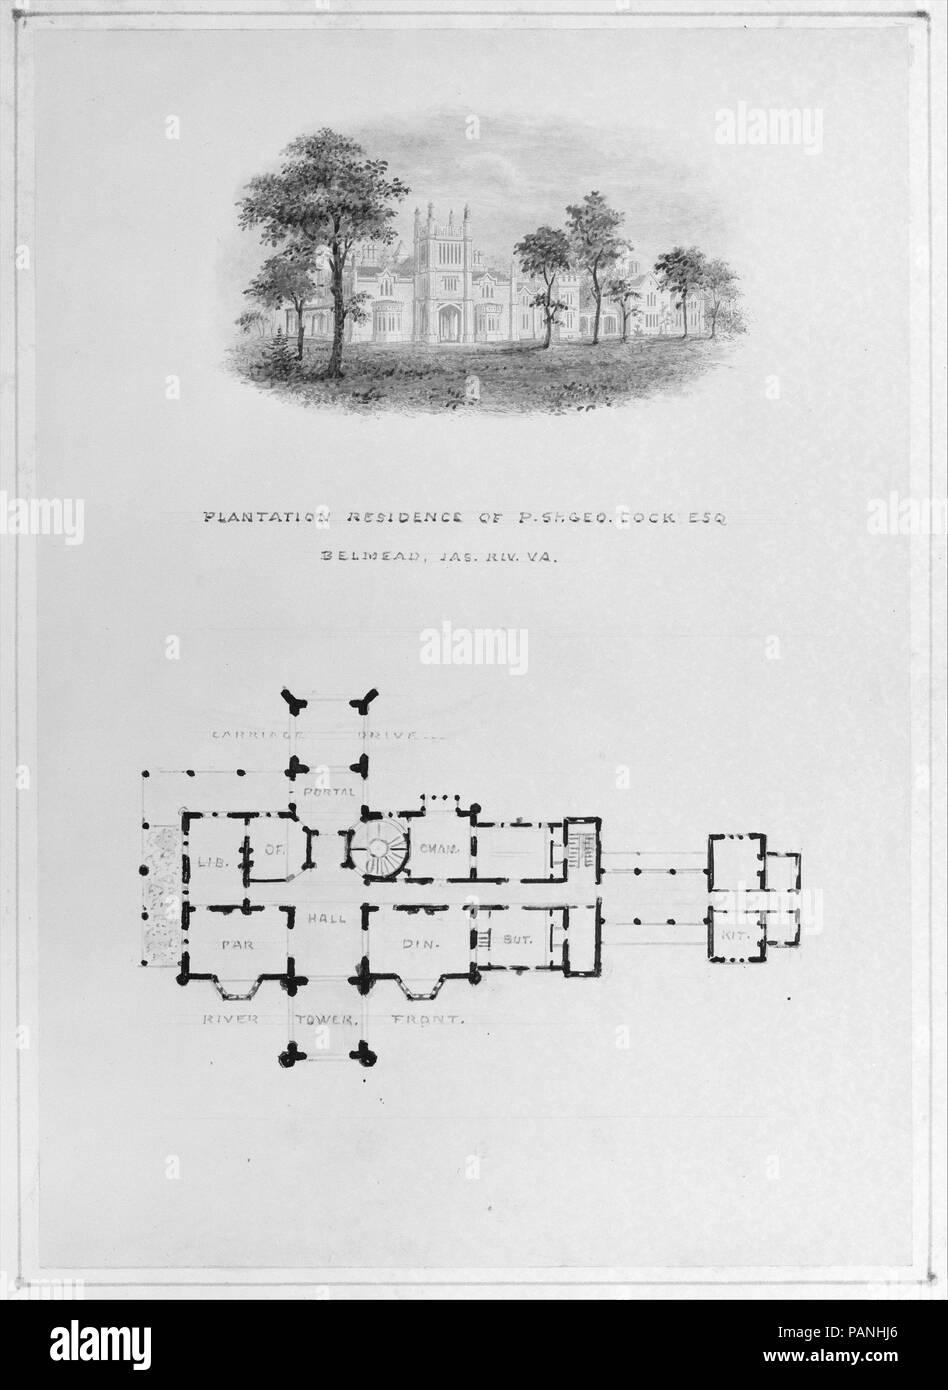 Alexander Wood Black And White Stock Photos Images Alamy Mechanical Electrical Plan Vignette Belmead James River Virginia Of Riverside Elevation Artist